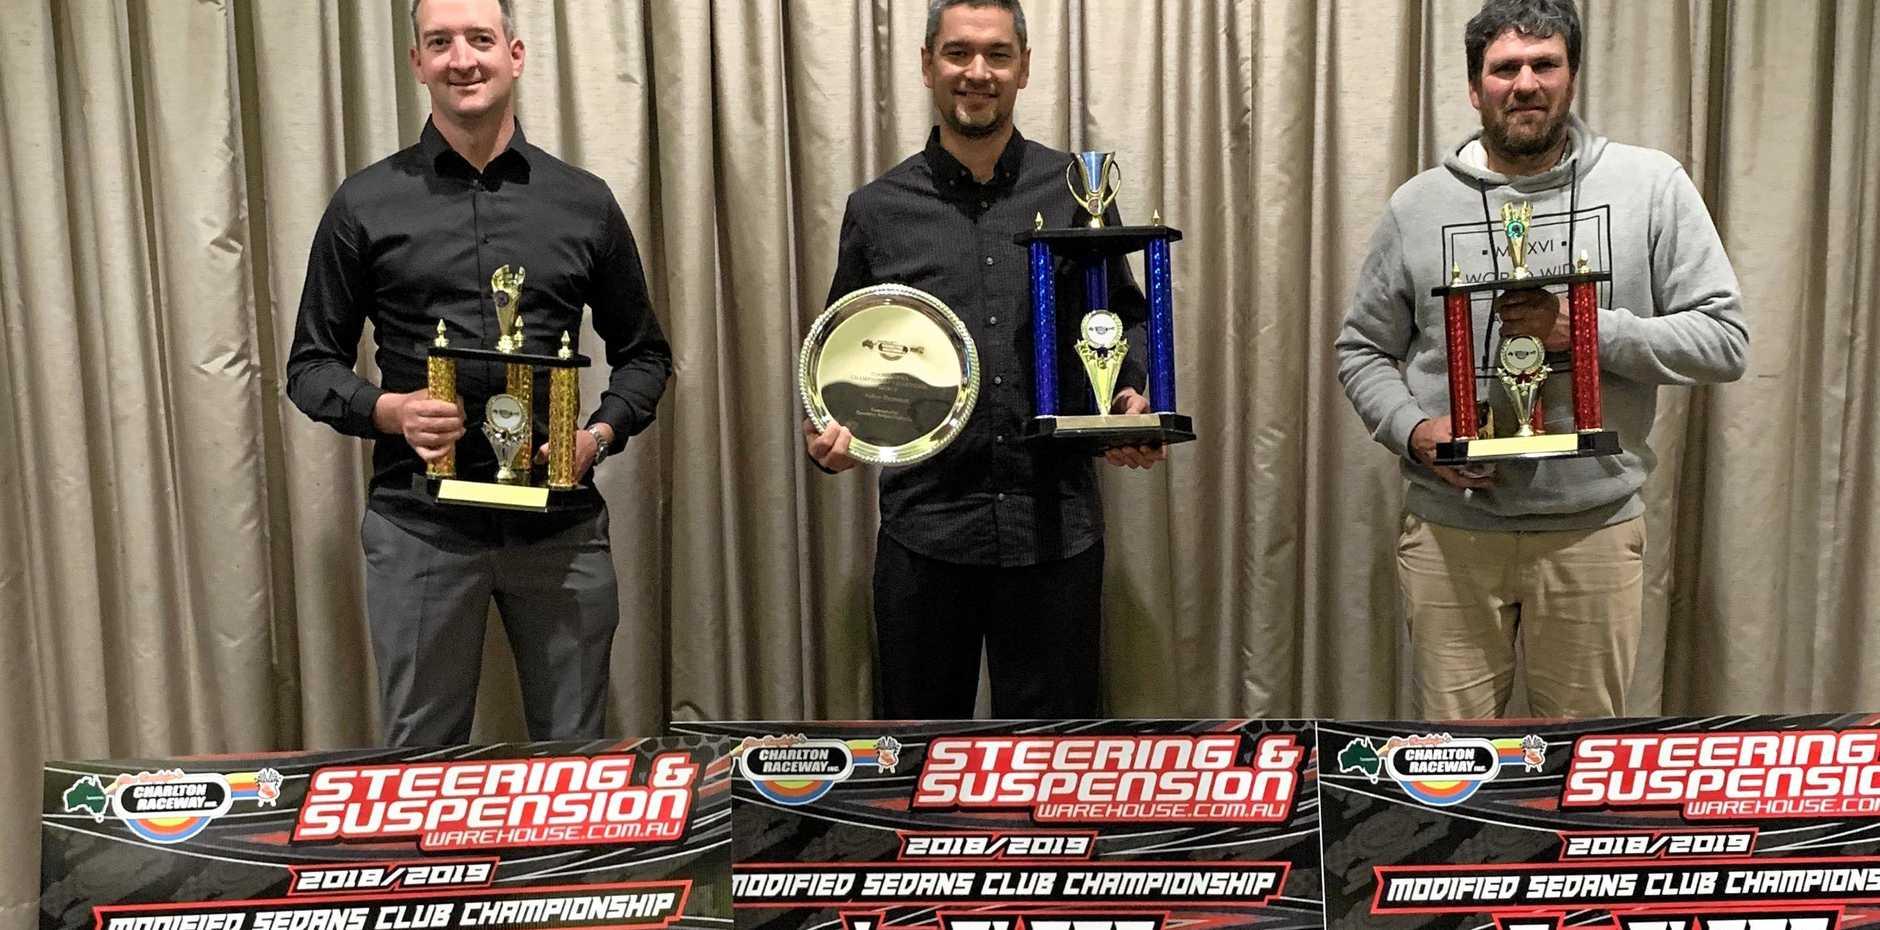 PODIUM FINISH: Celebrating their Toowoomba Speedway Club modified sedans championship podium finishes are (from left) Nathan Macdonald, Aidan Raymont and Rodney Pammenter.